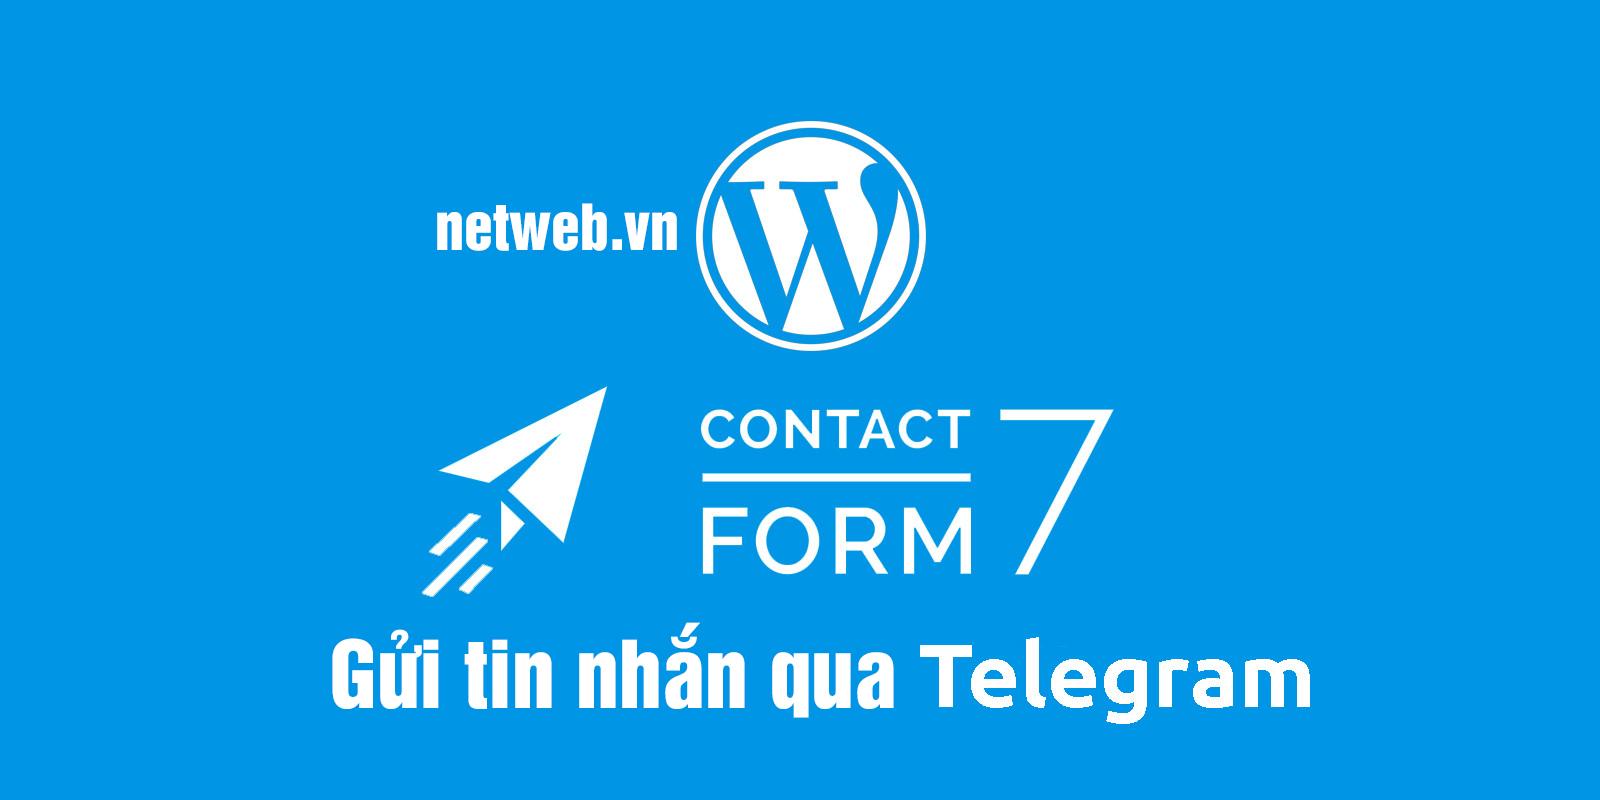 Cách Gửi tin nhắn Contact Form 7 tới Telegram